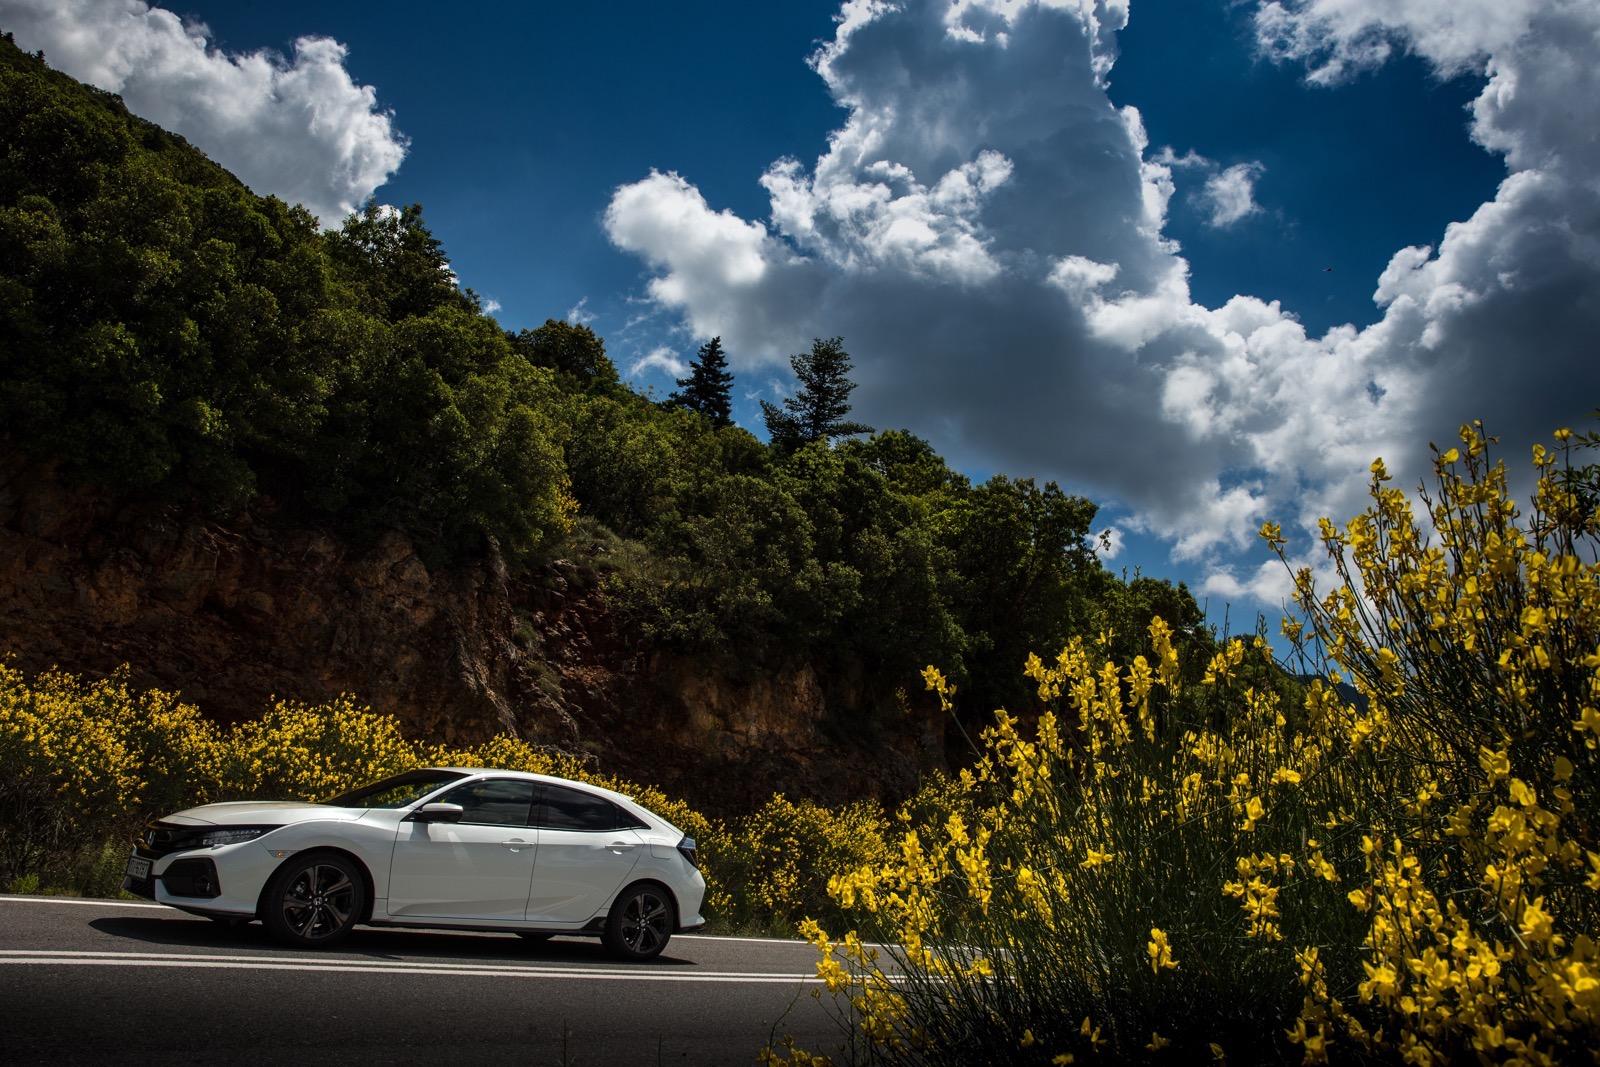 New_Honda_Civic_First_Drive_80